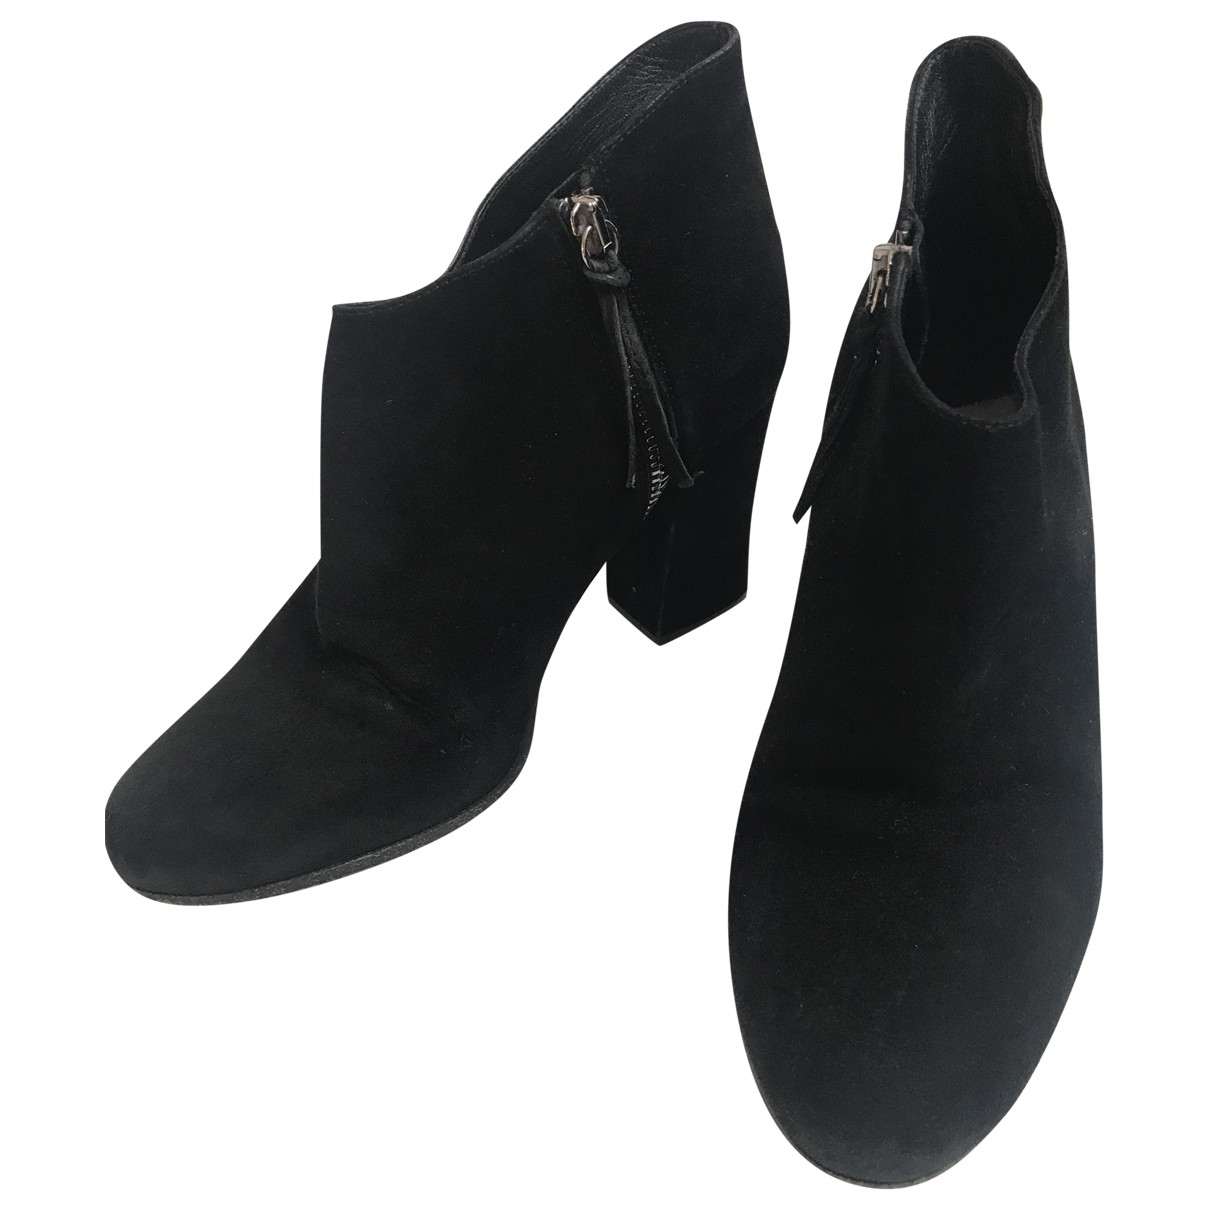 Miu Miu N Black Velvet Ankle boots for Women 35 EU